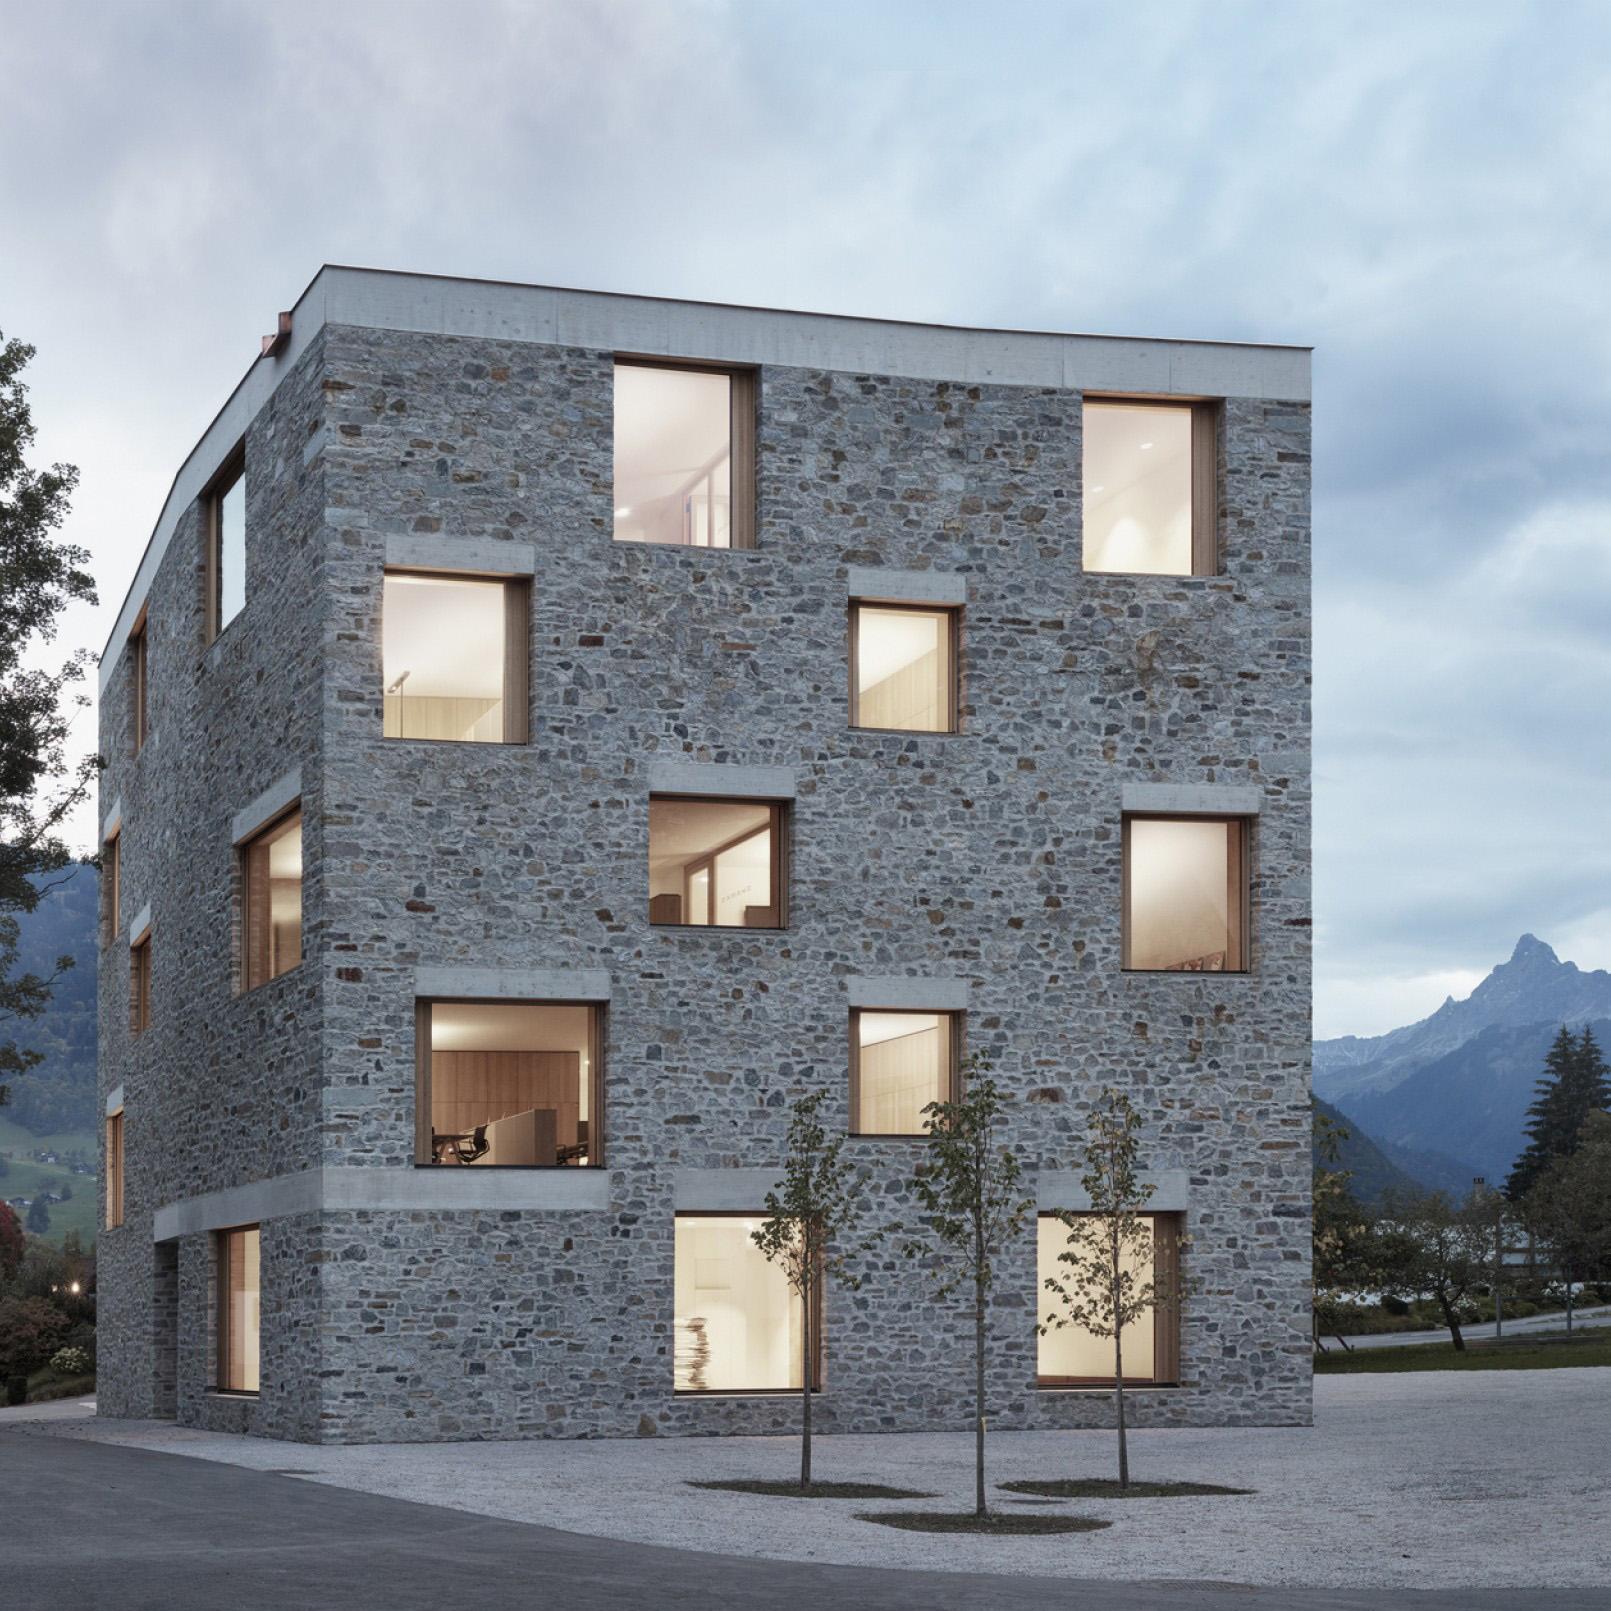 Dezeen Awards 2019 longlist - Alpin Sport, Schruns, Austria, by Bernardo Bader Architekten